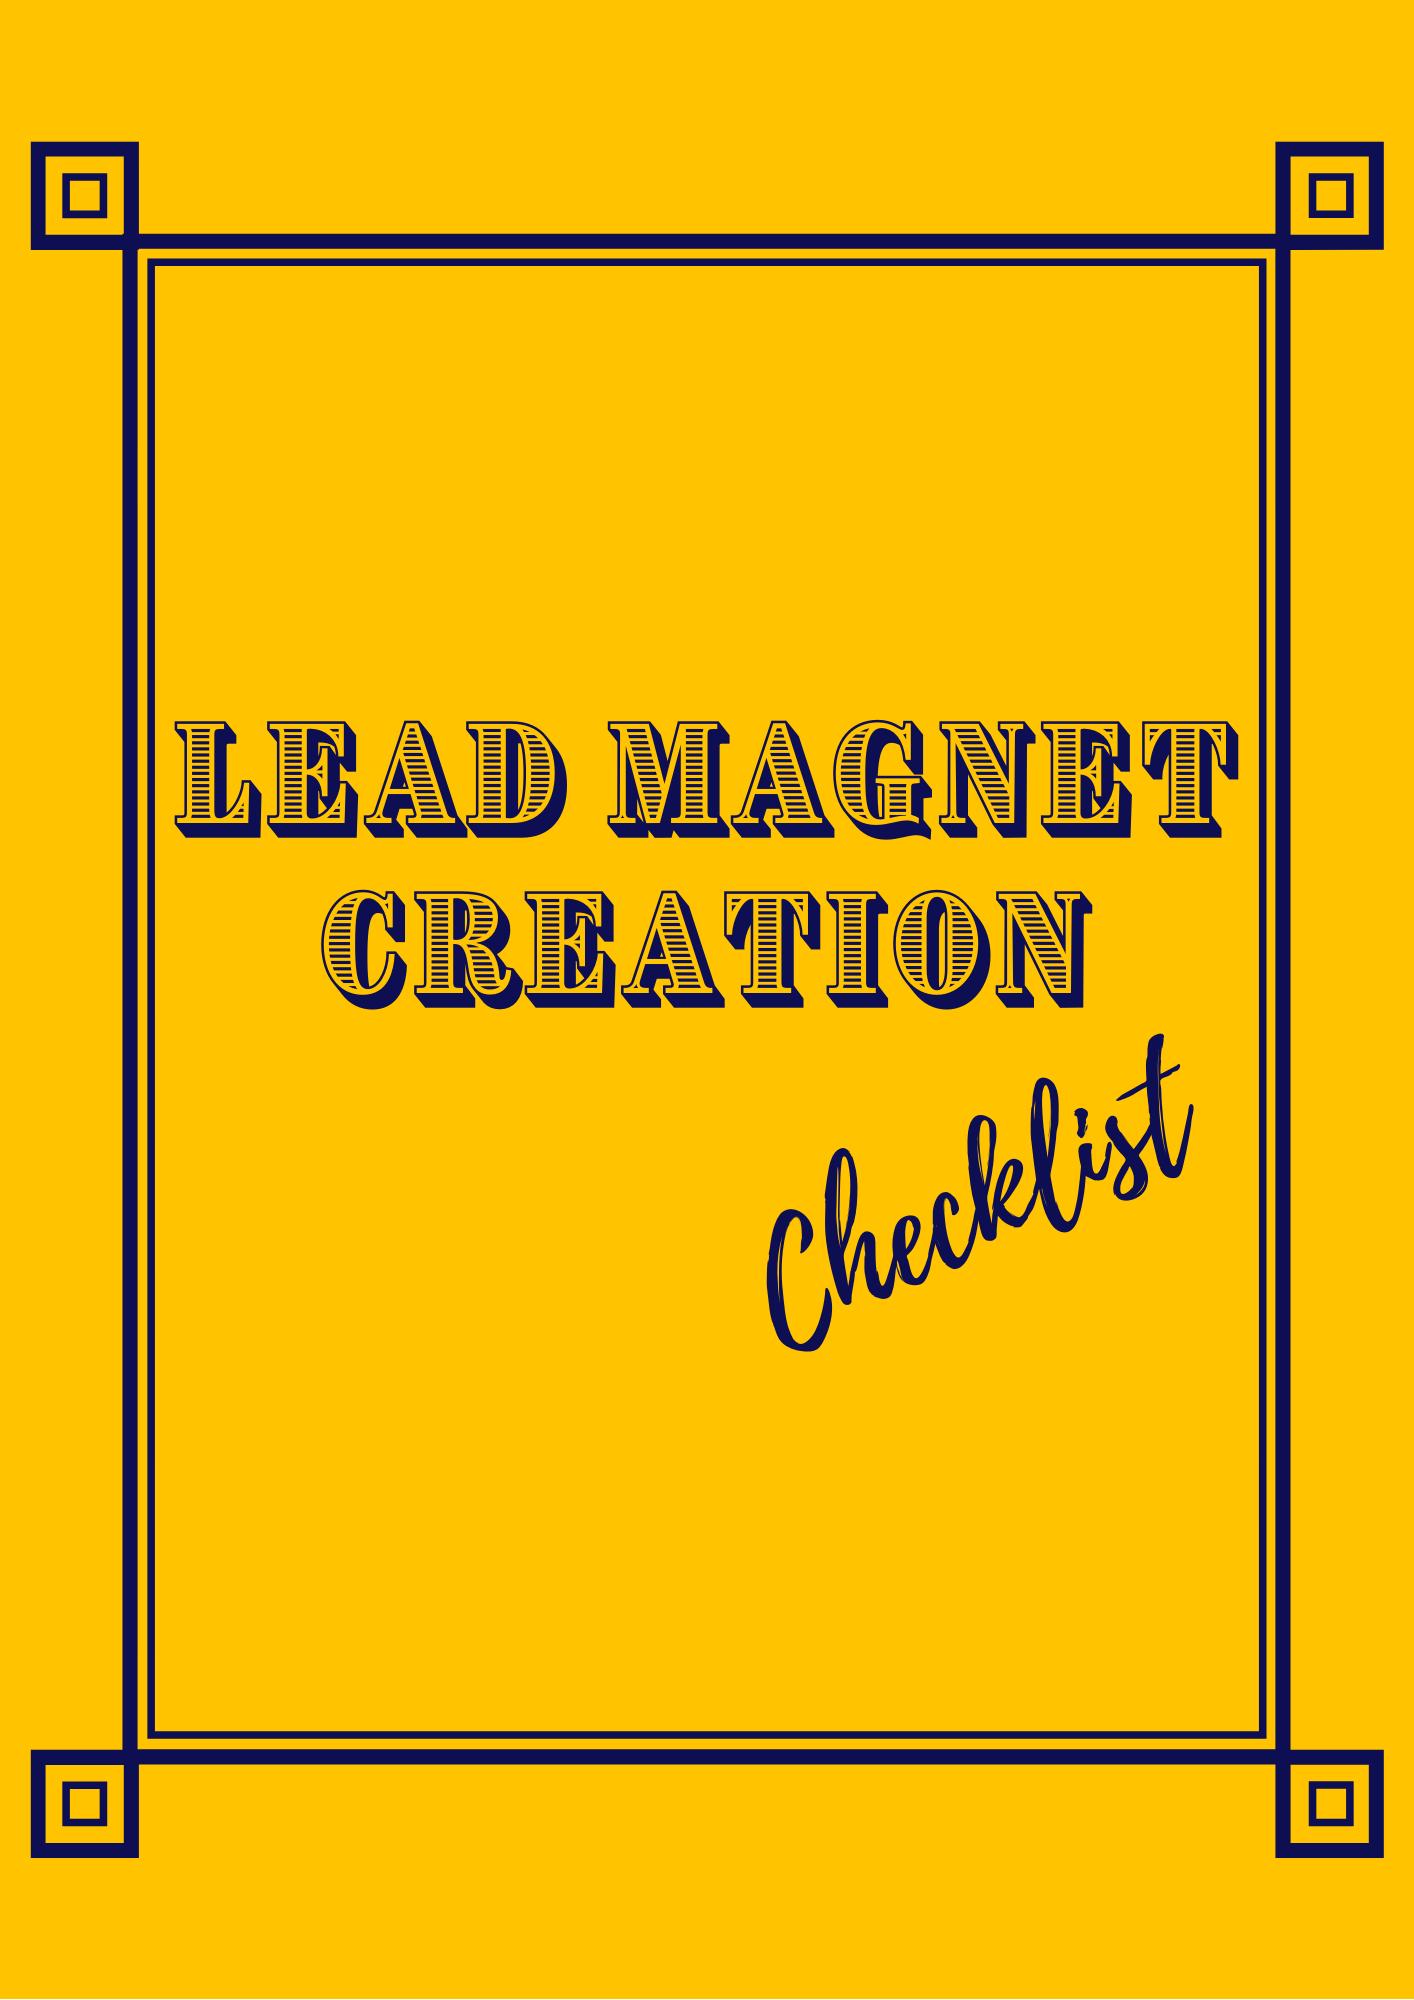 Lead Magnet Creation